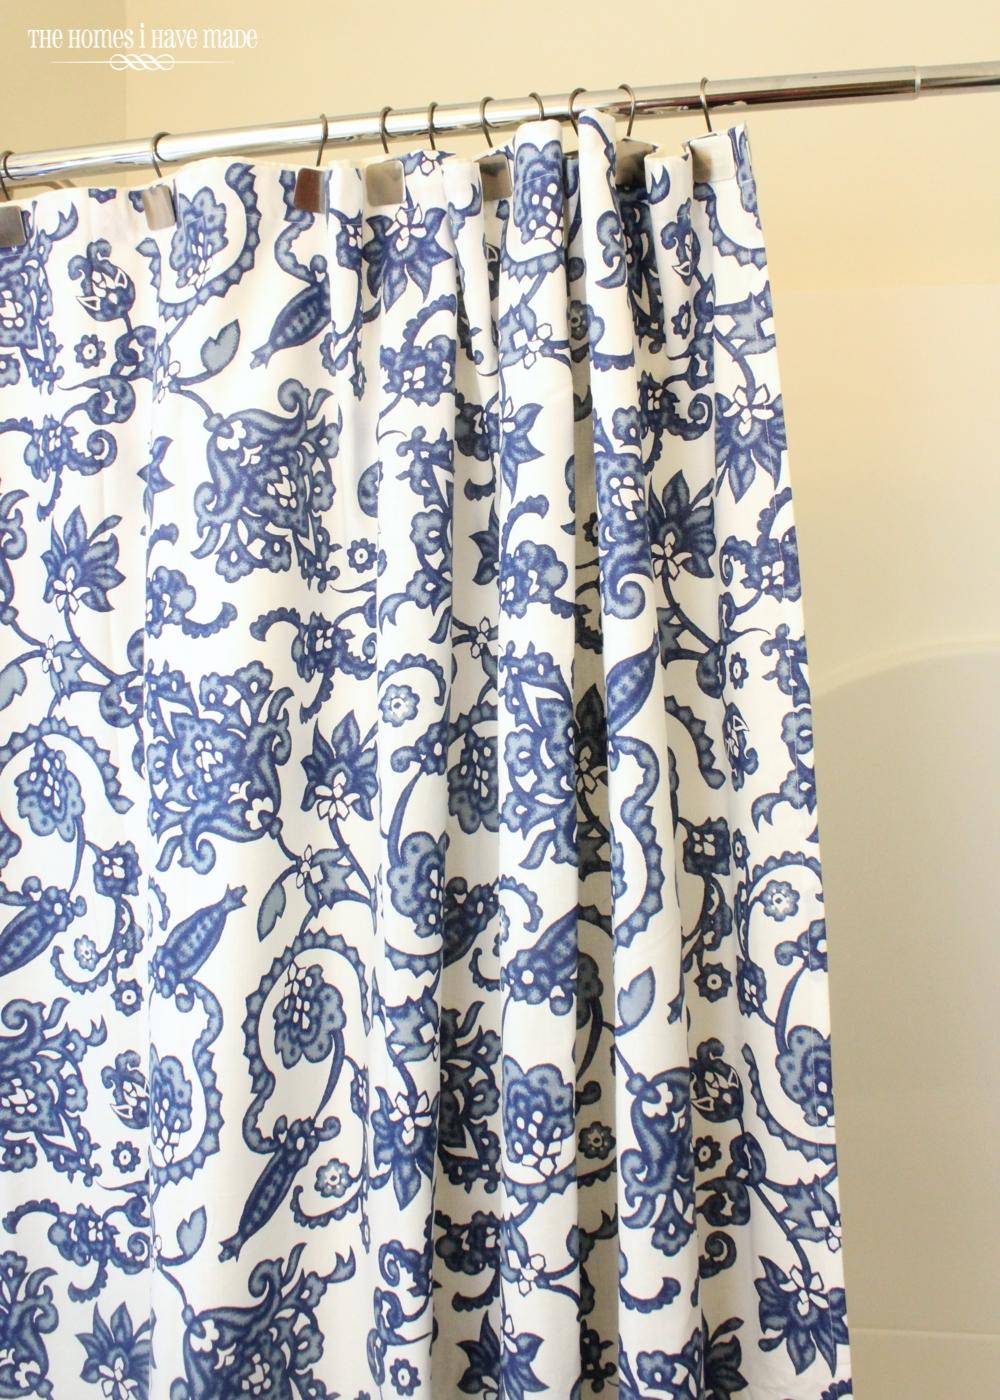 Black bathroom shower curtains - Black And White Shower Curtain Target Black And White Shower Curtain Target